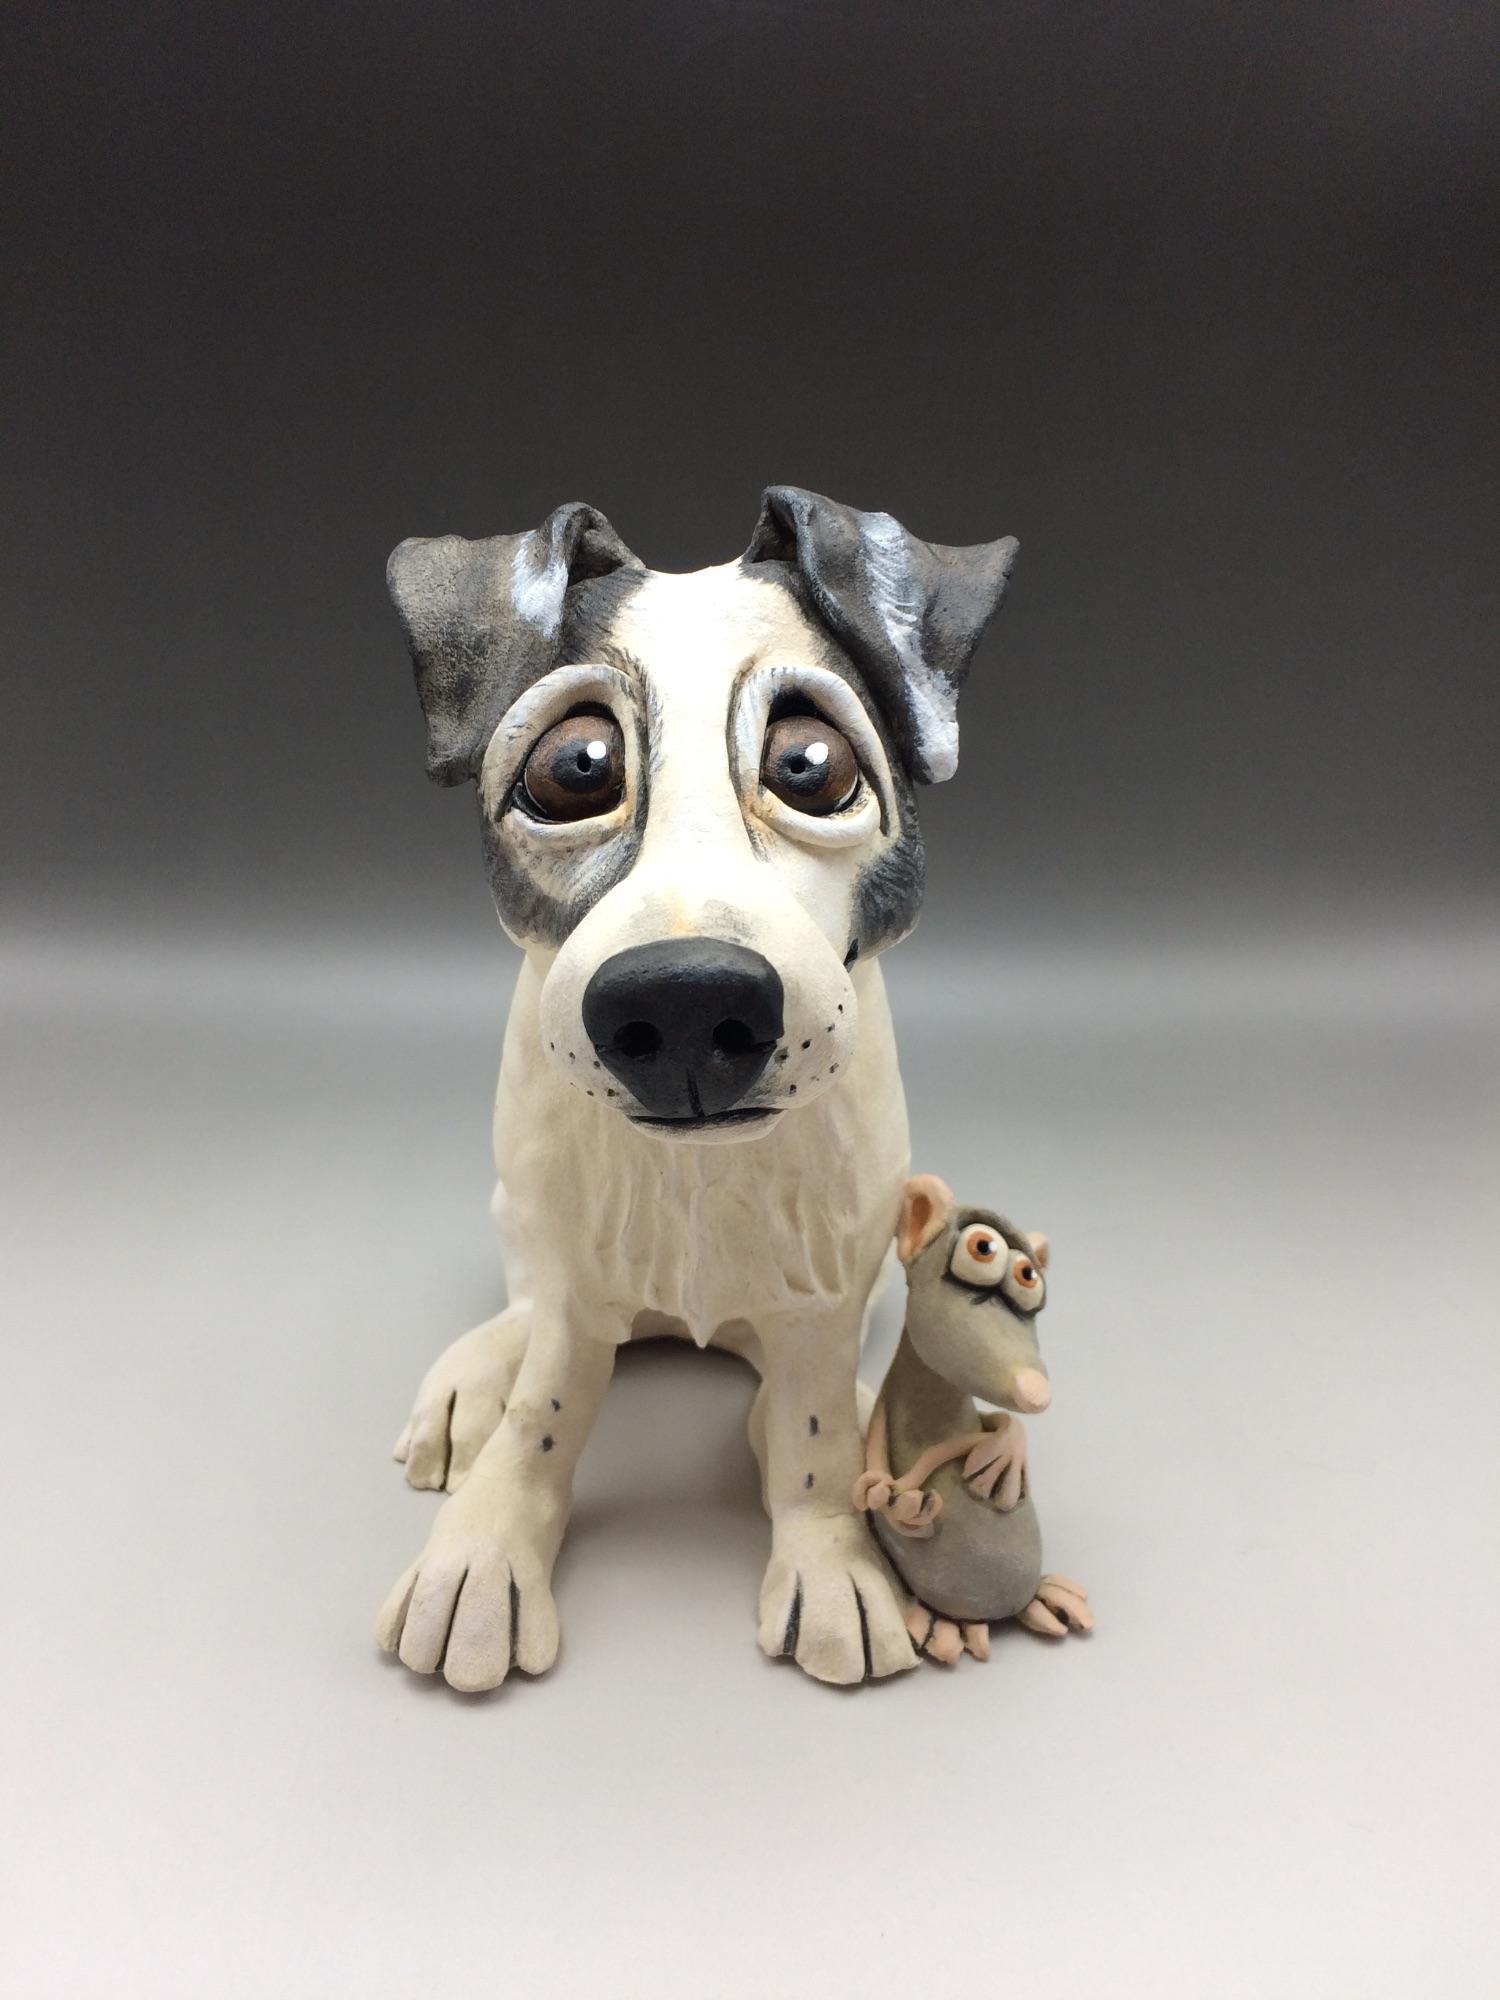 Jack Russell Terrier Dog Sculpture Ceramic